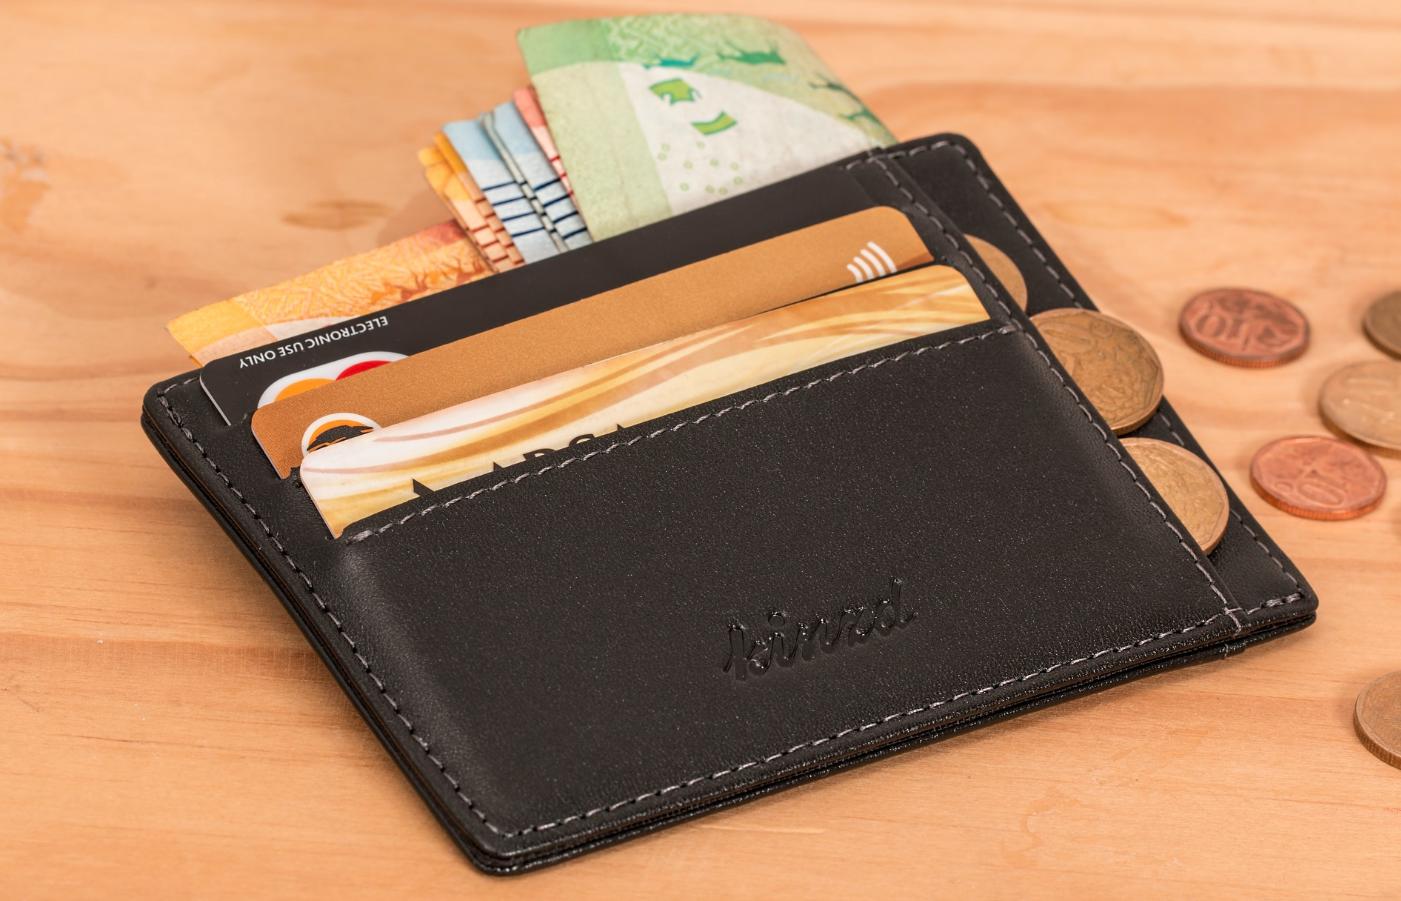 Storing Bitcoins in a digital wallet